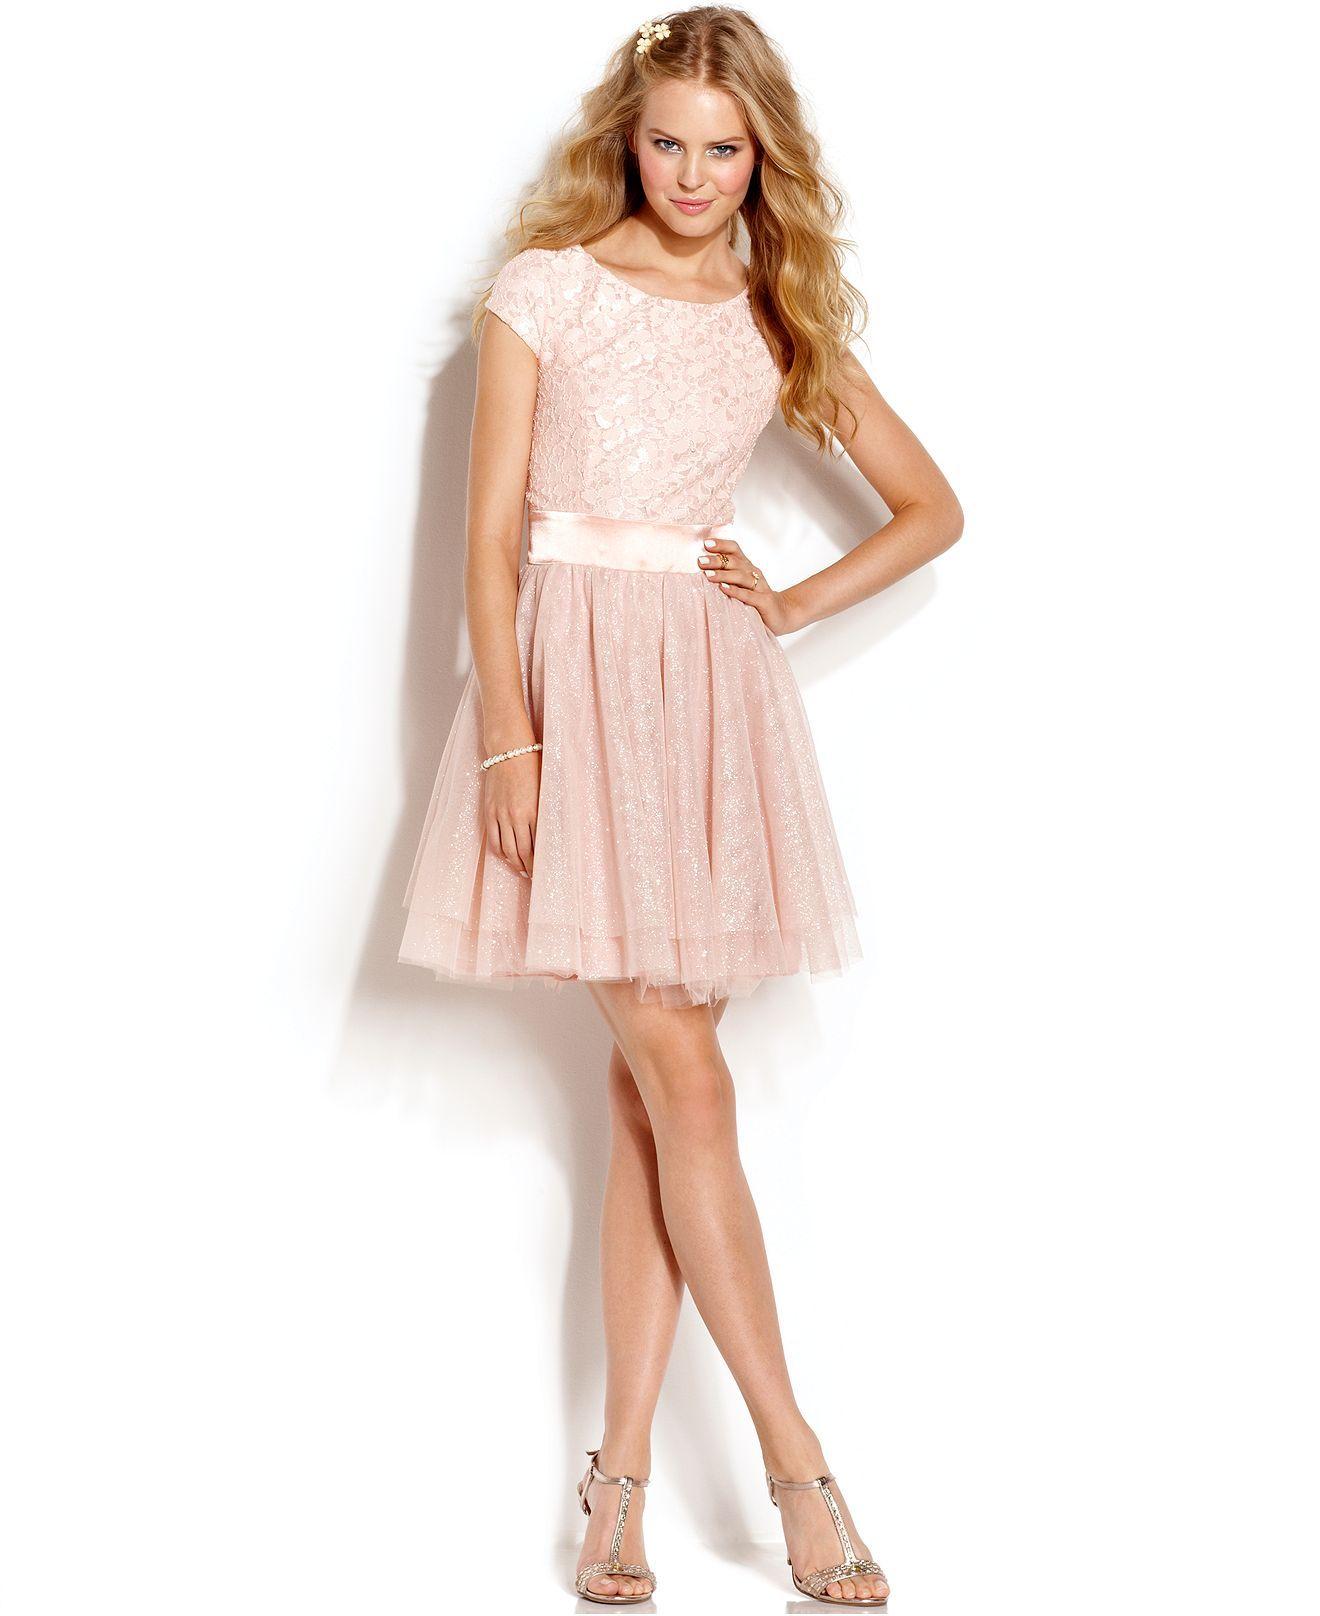 Trixxi juniorsu lace glittered tulle dress juniors prom dresses